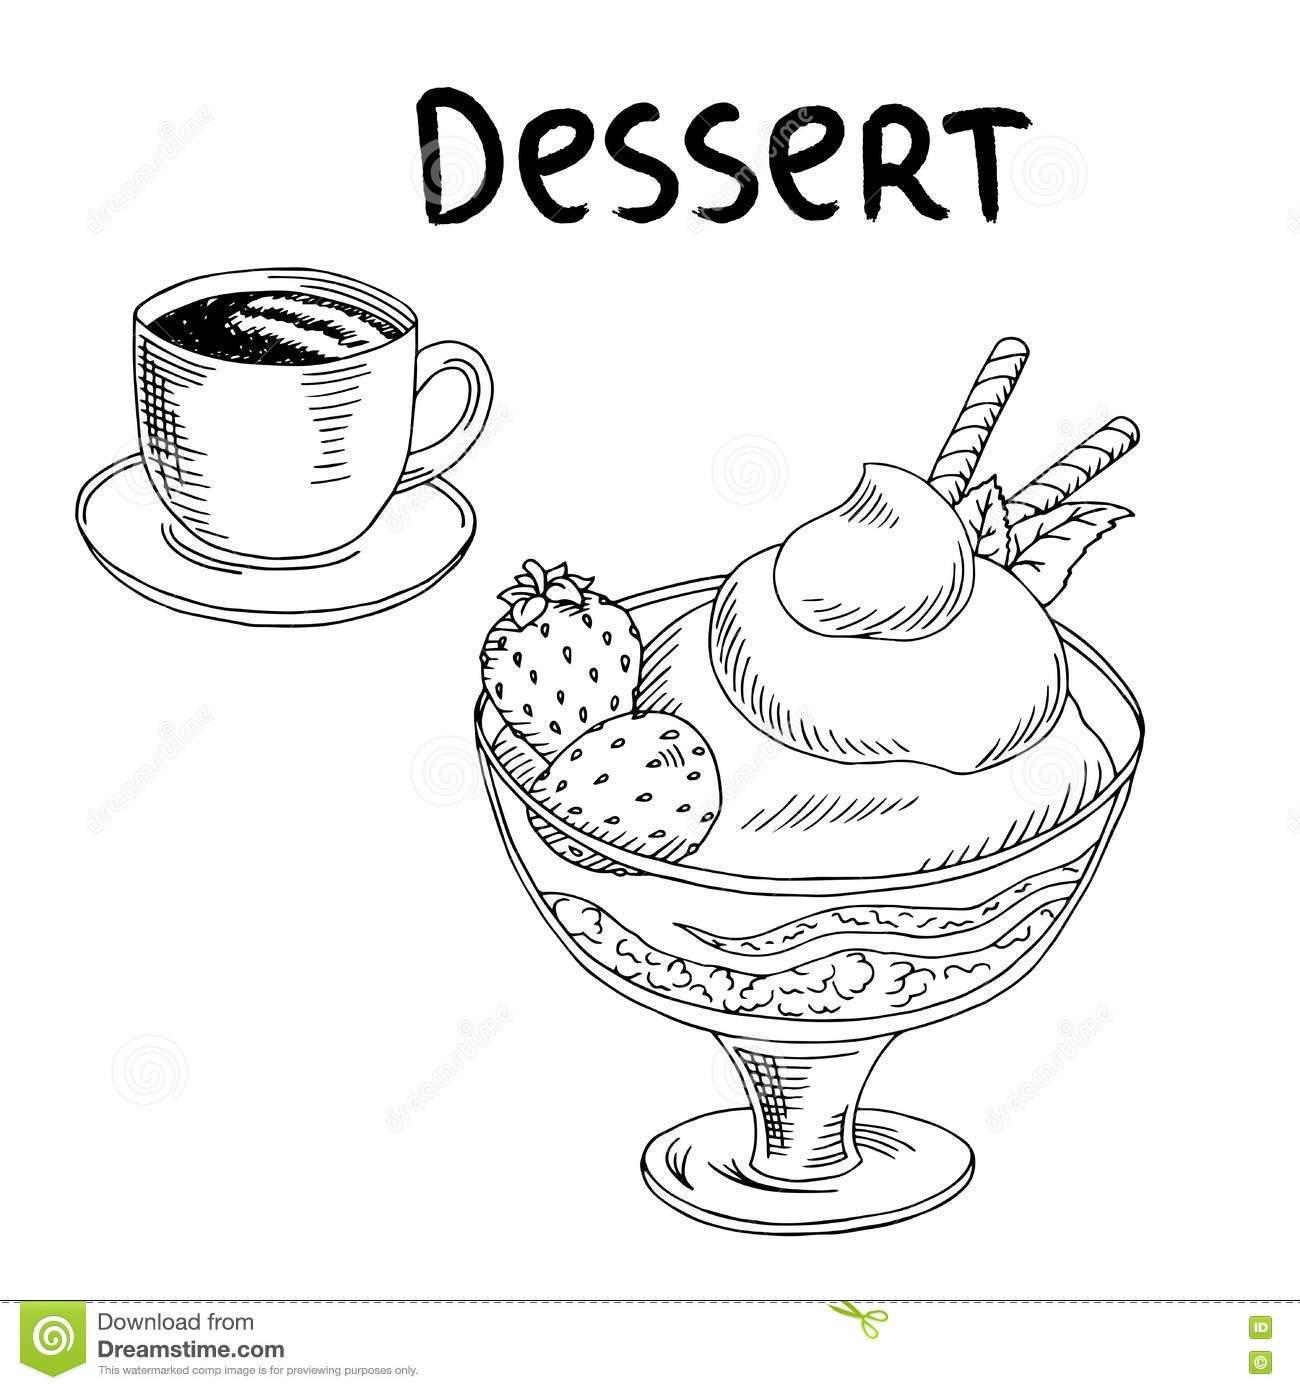 Desserts clipart black and white 2 » Clipart Portal.